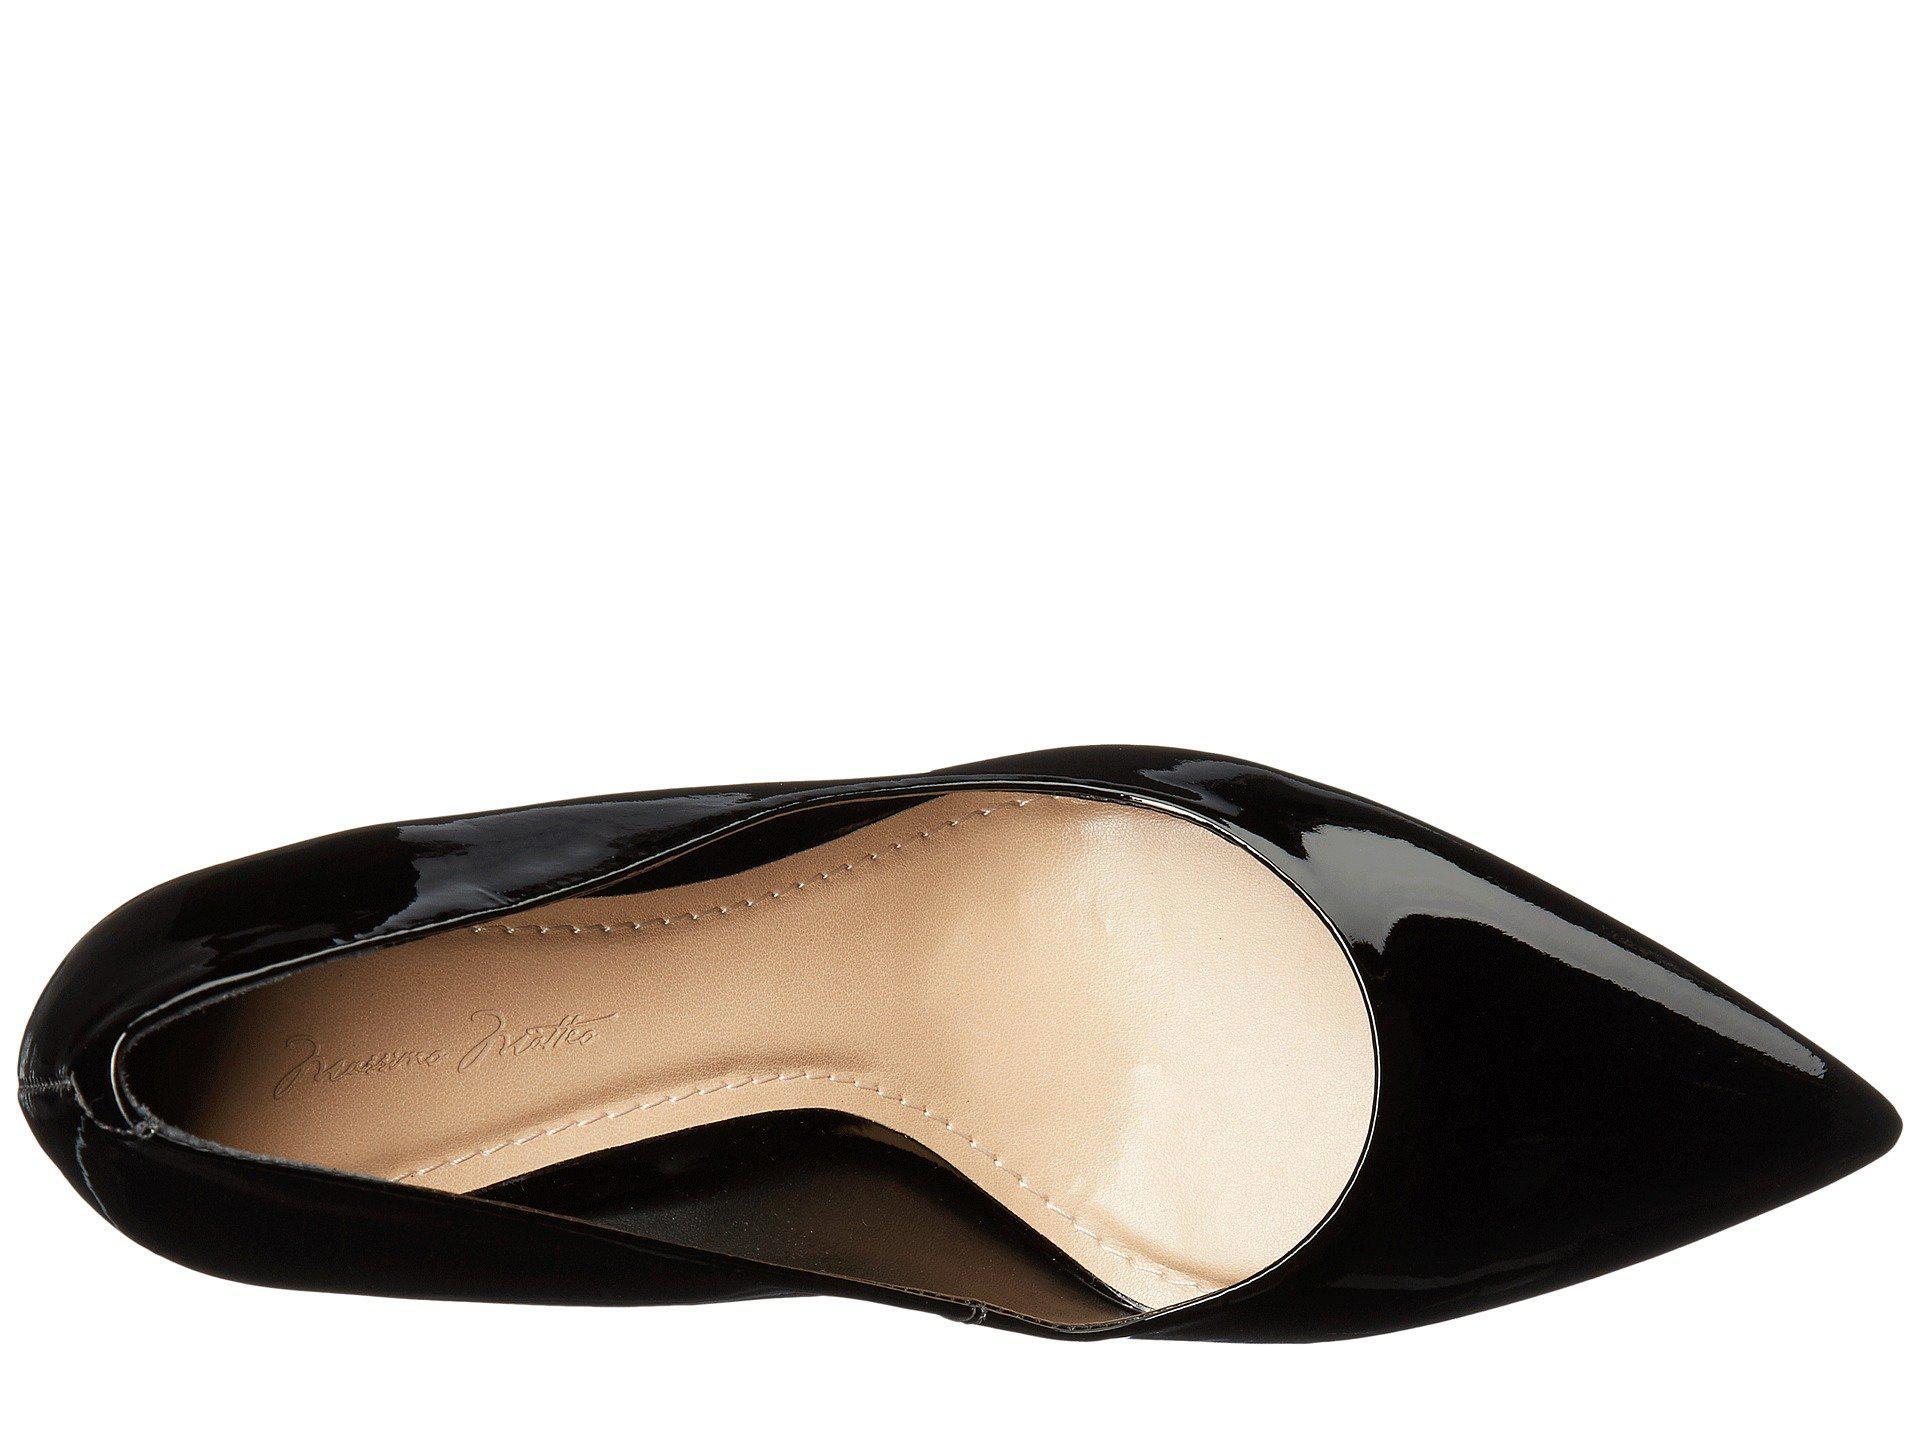 c3eab55adf6a Massimo Matteo - Block Heel Pump (black Patent) High Heels - Lyst. View  fullscreen